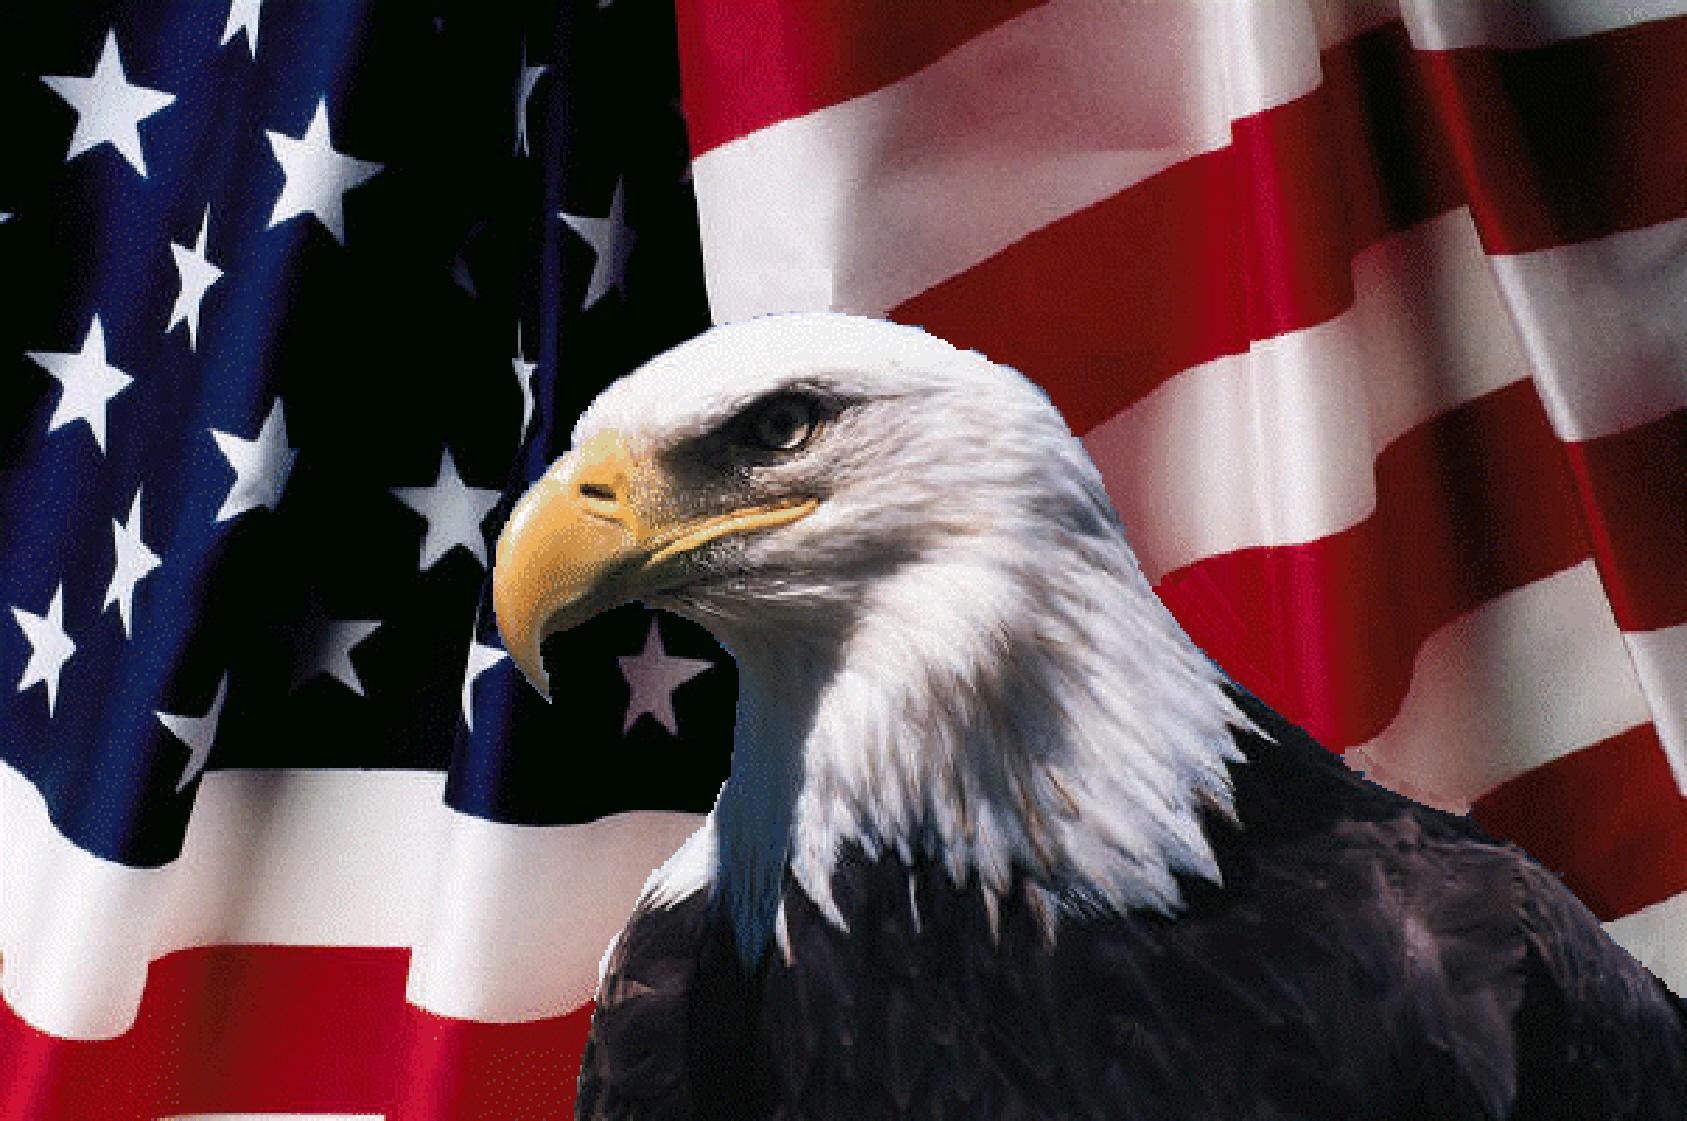 american-flag-and-eagle-2